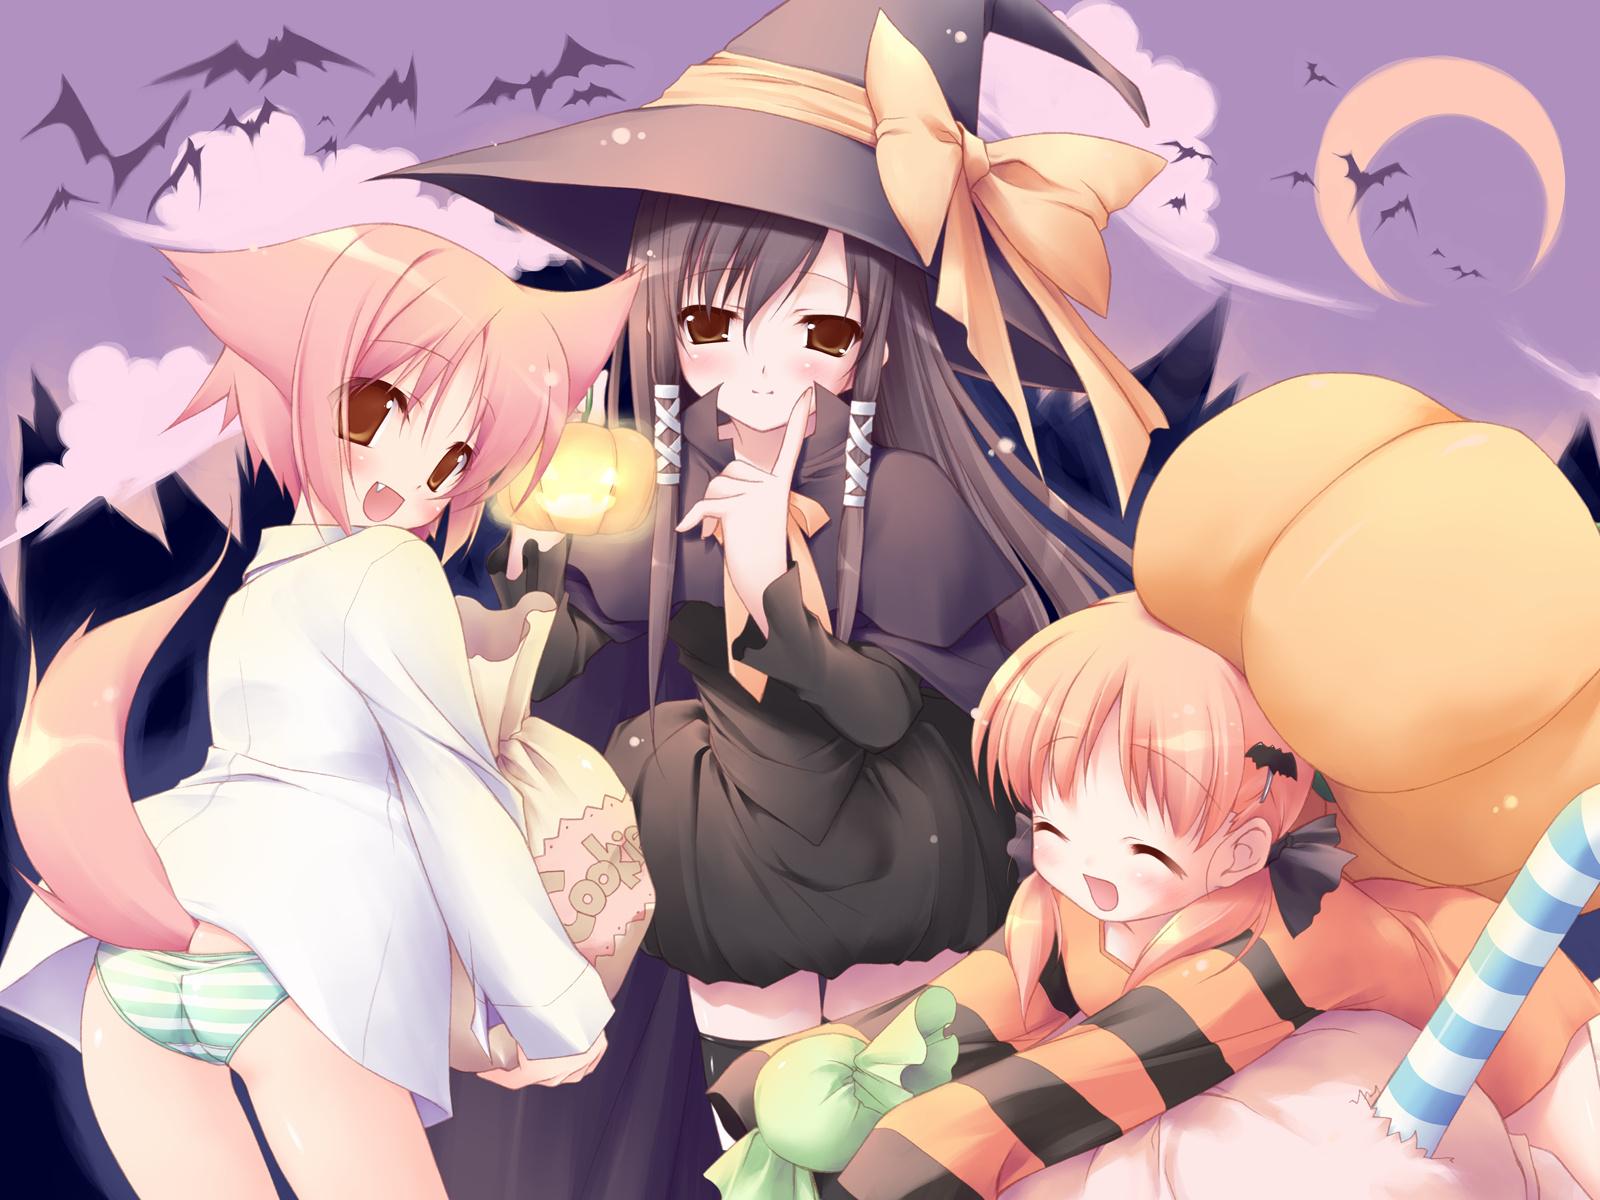 kitsune mimi fox girls halloween wallpaper anime wallpapers